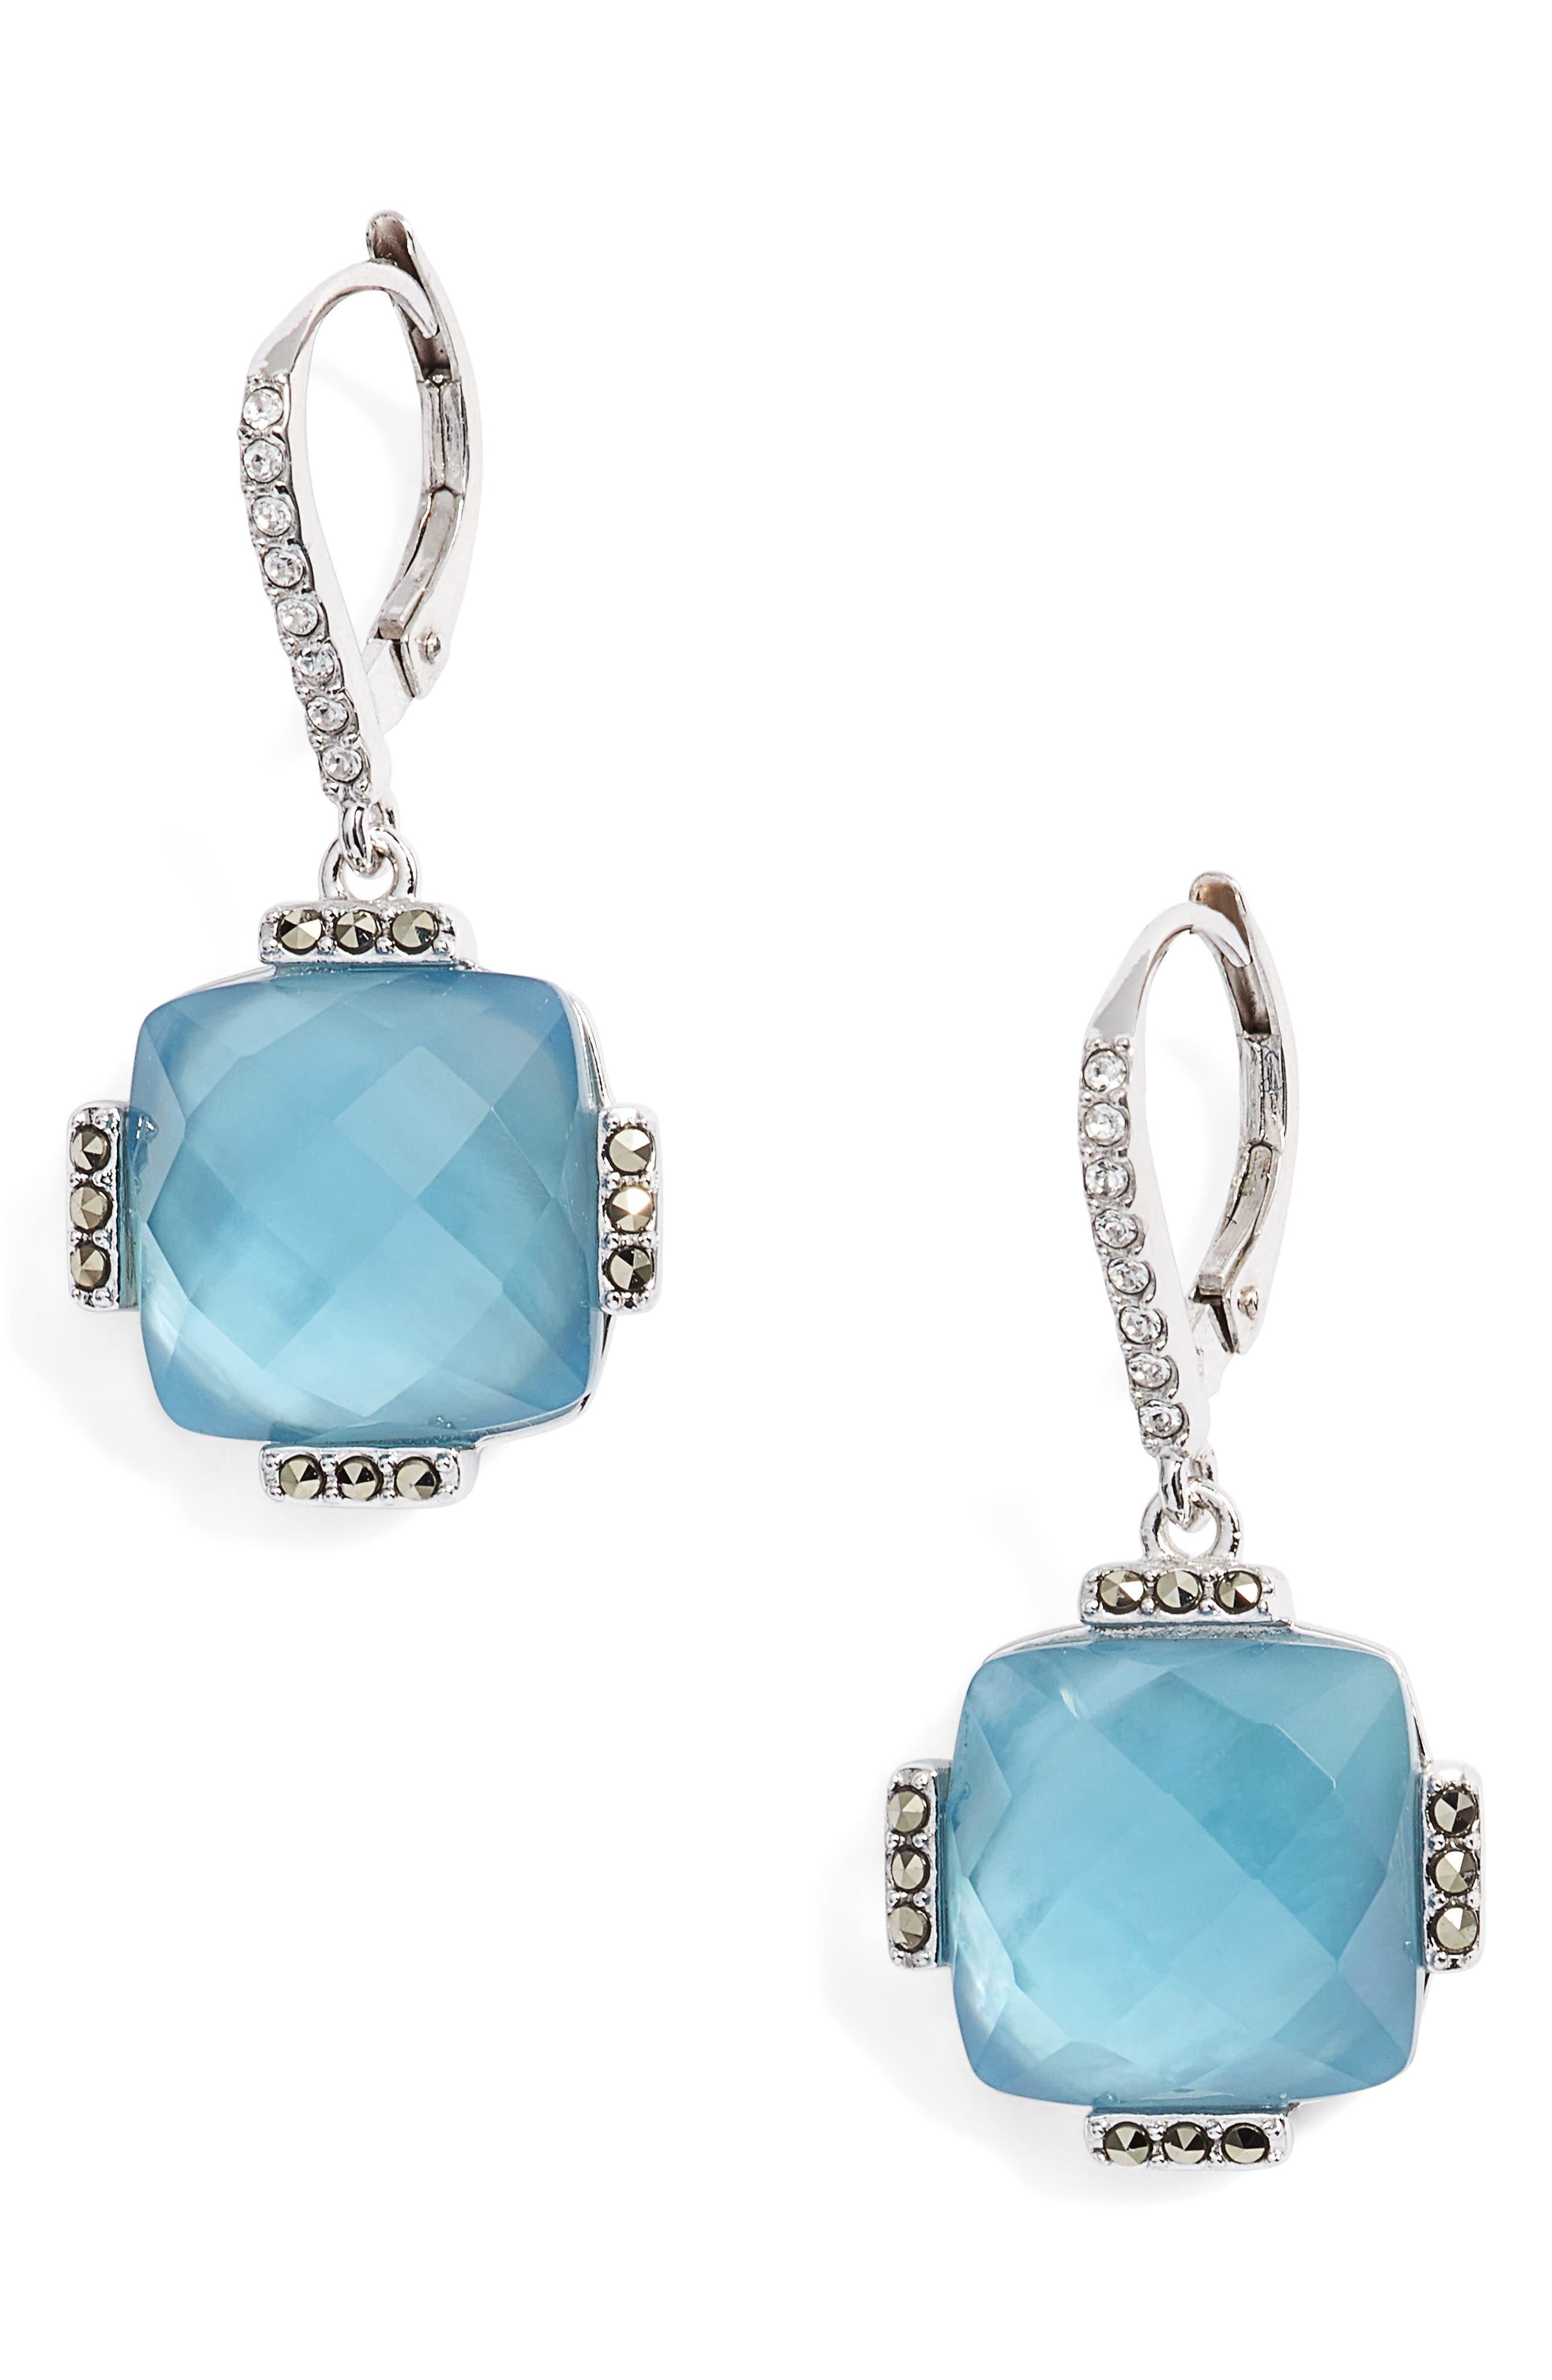 Doublet Drop Earrings,                             Main thumbnail 1, color,                             Blue/ Silver